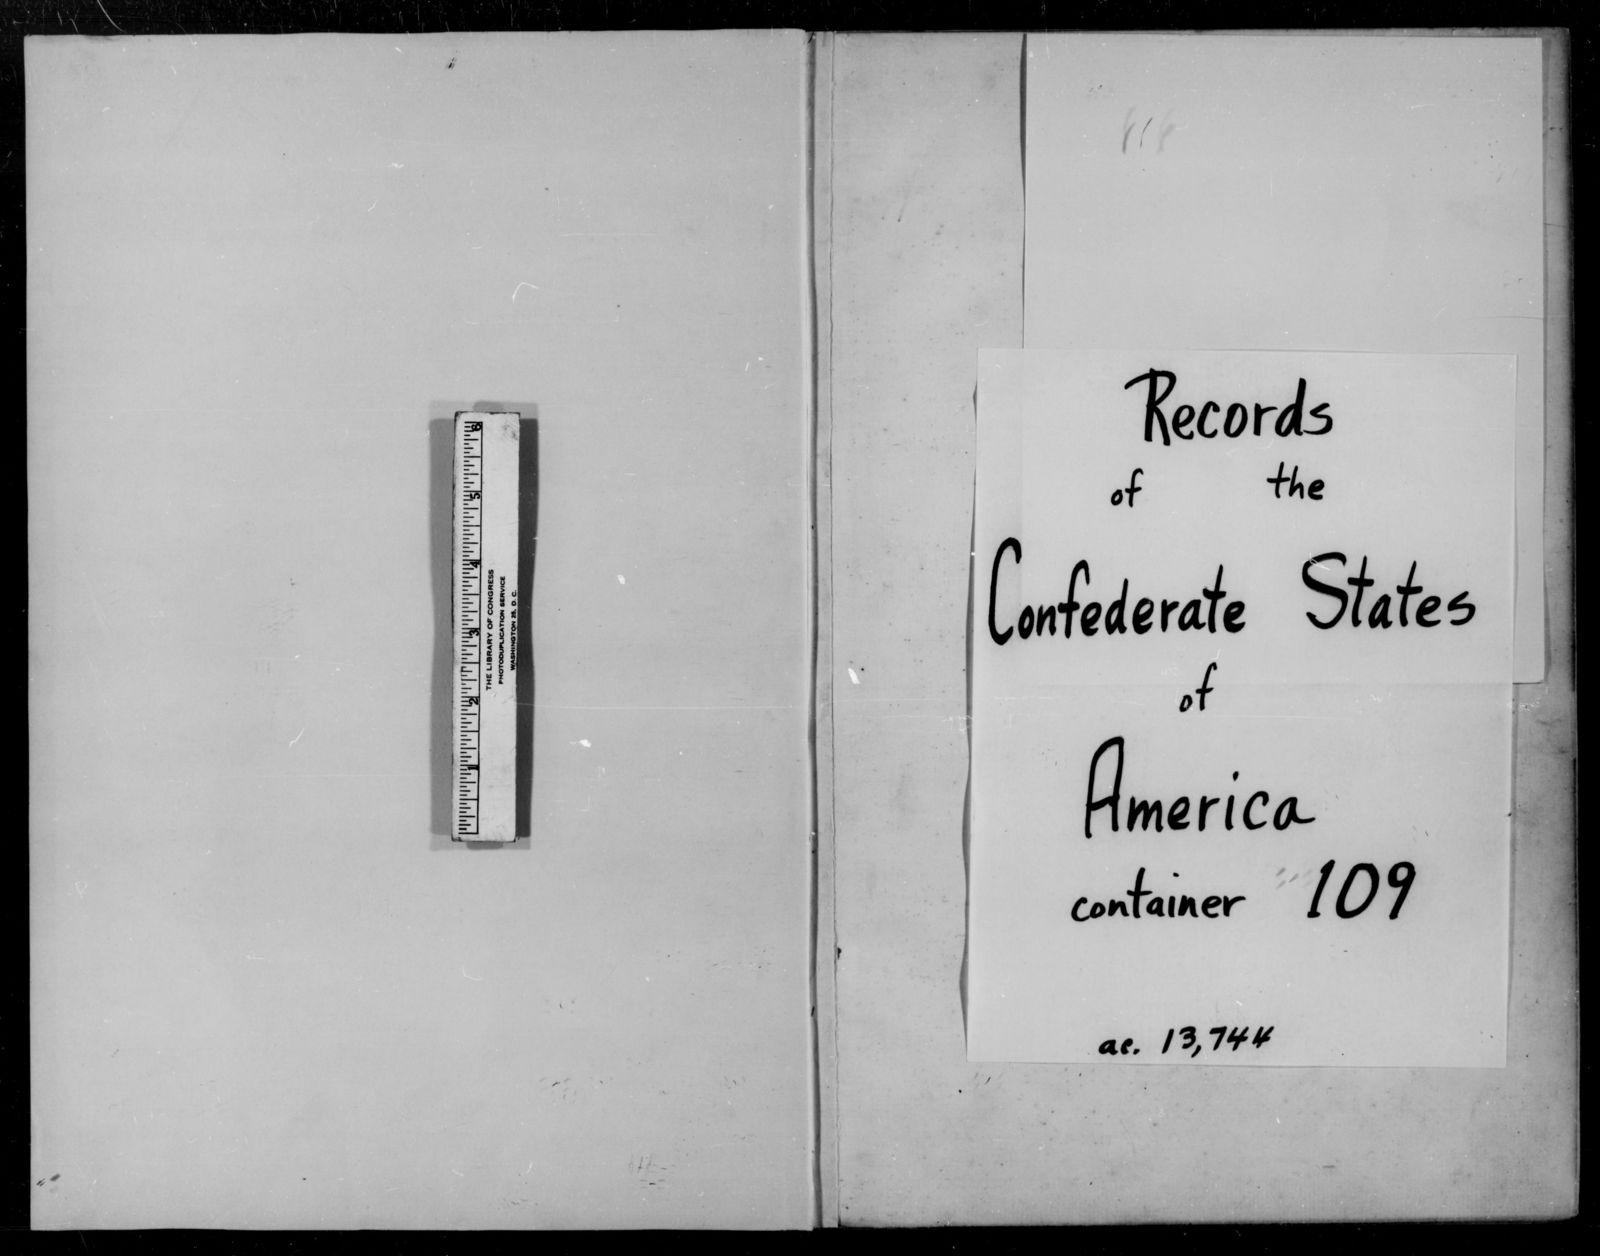 Confederate States of America records: Microfilm Reel 63